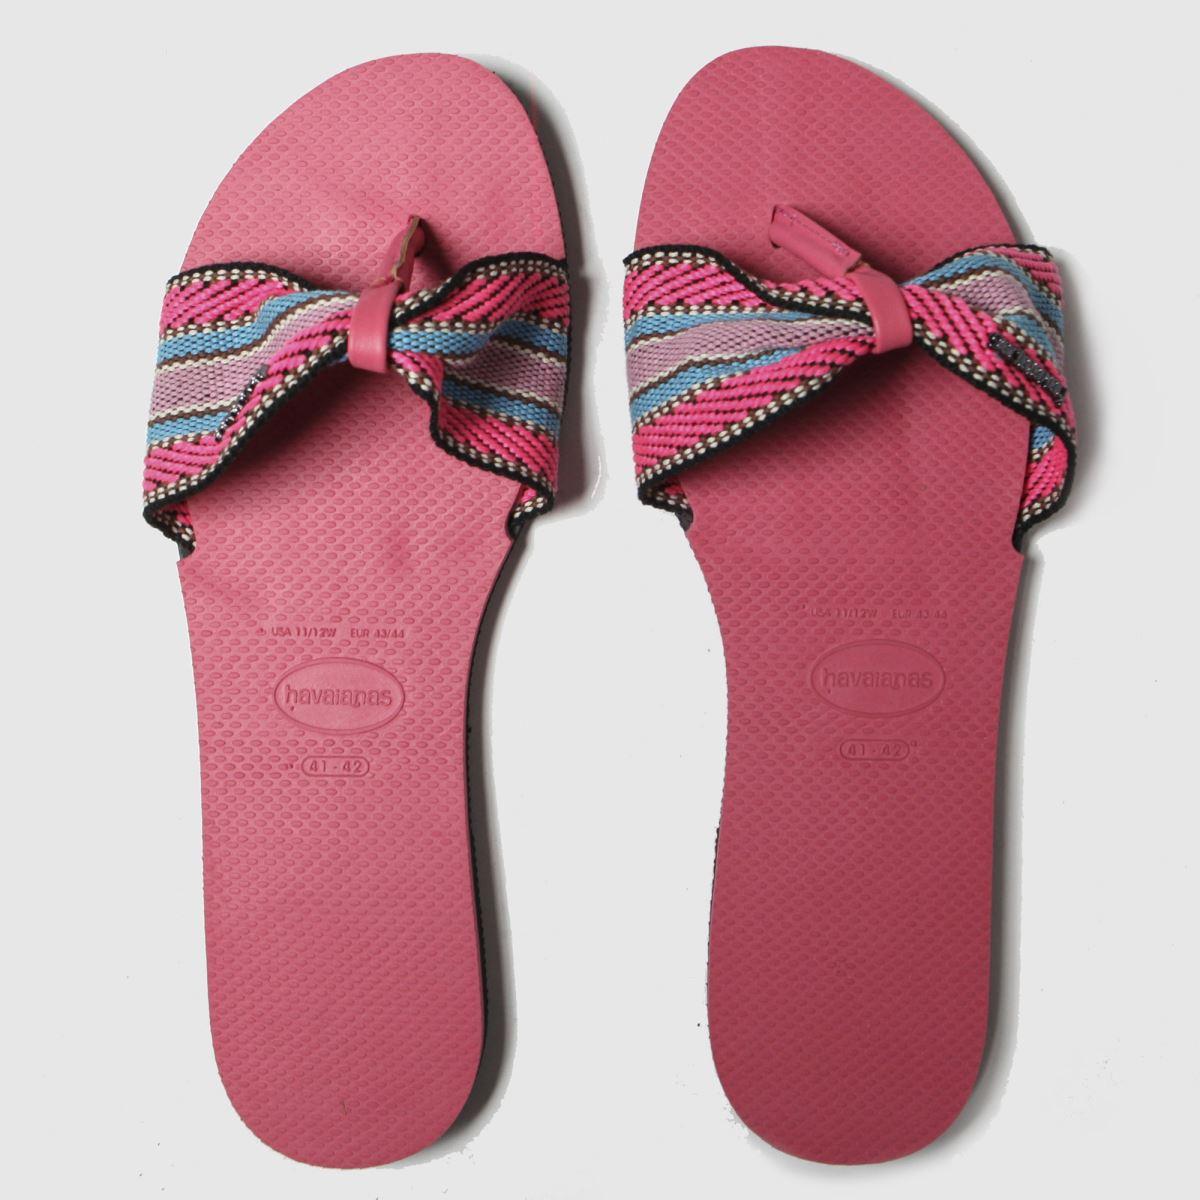 Havaianas Pink You St Tropez Fita Sandals